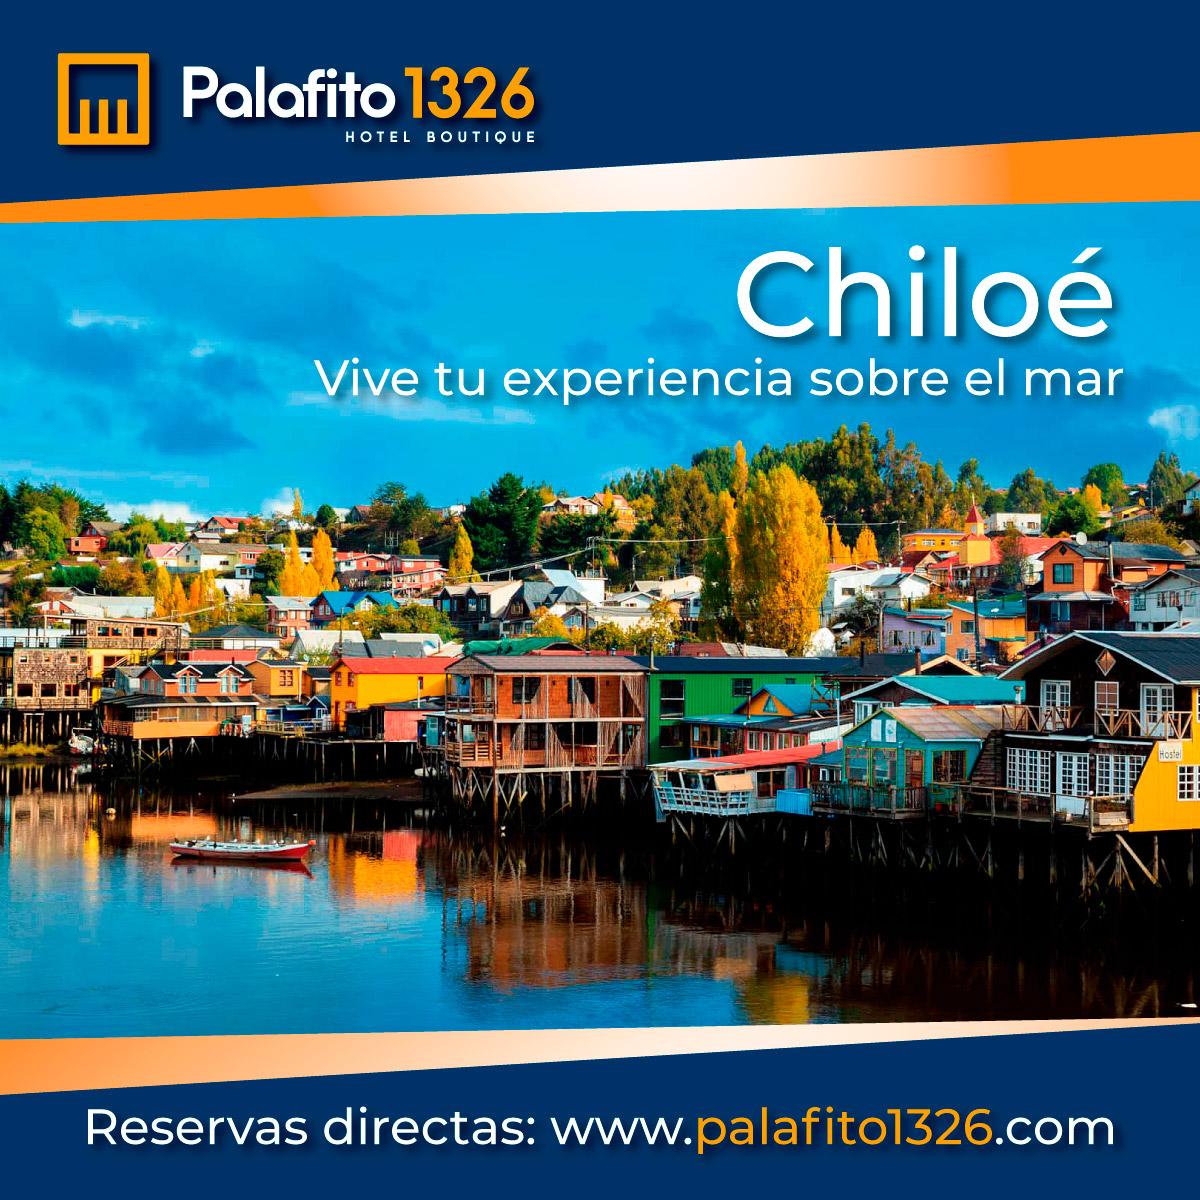 Oferta Semana Santa en Chiloé Palafito 1326 Hotel Boutique Chiloé Patagonia Chile Vacaciones 2021